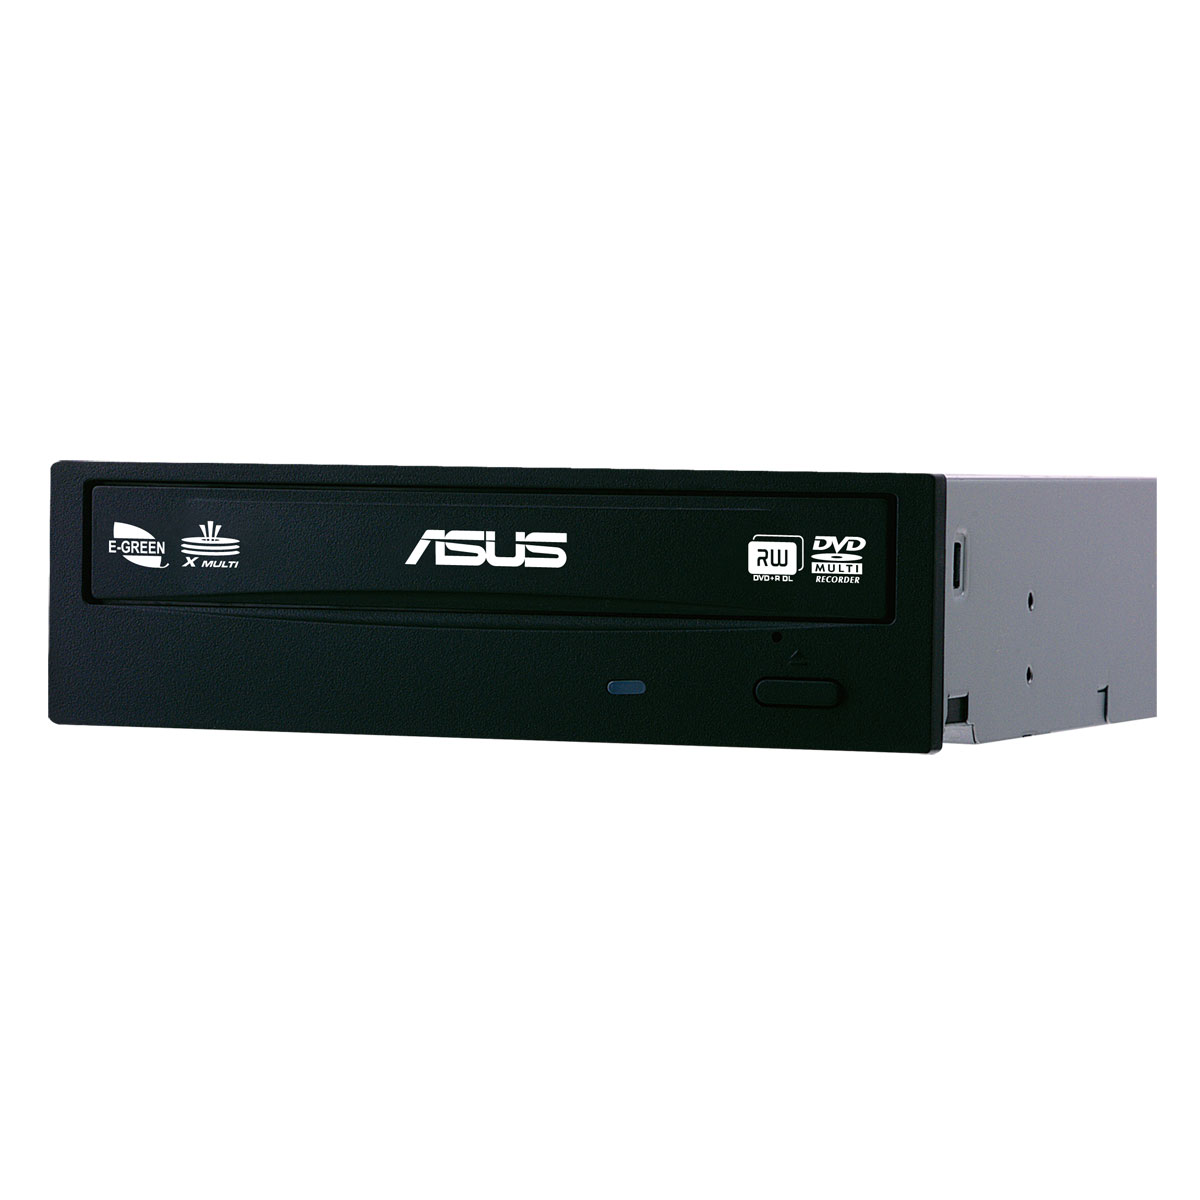 Lecteur graveur ASUS DRW-24F1ST (bulk) DVD(+/-)RW/RAM 24/8/24/6/12x DL(+/-) 8/8x CD-RW 48/24/48x SATA - Noir (bulk)